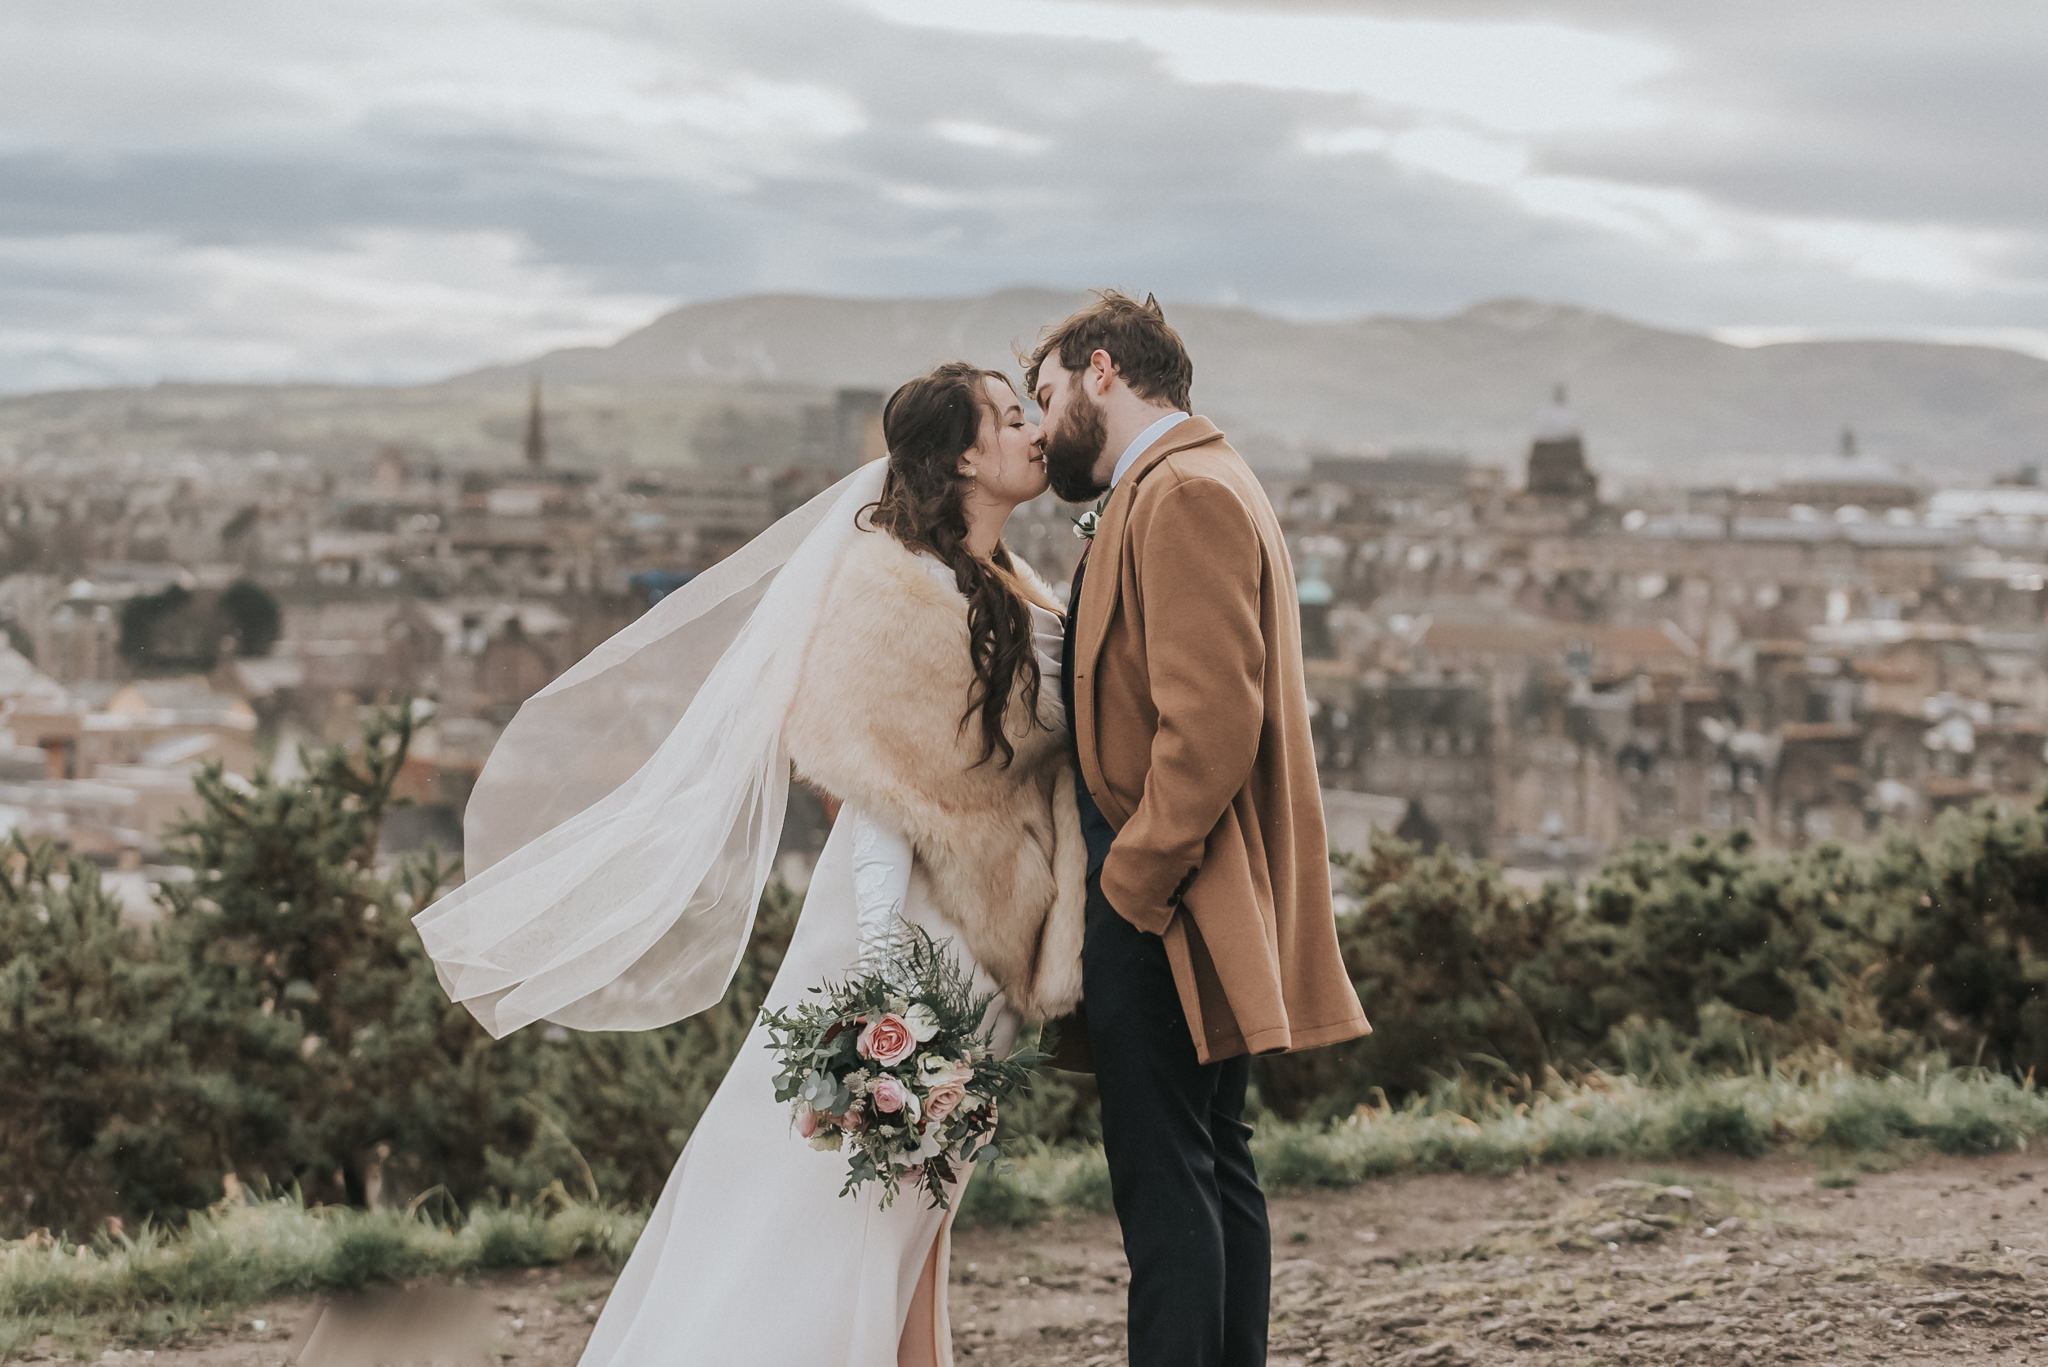 Karol Makula Photography, wedding photographer Edinburgh, wedding photographer Scotland